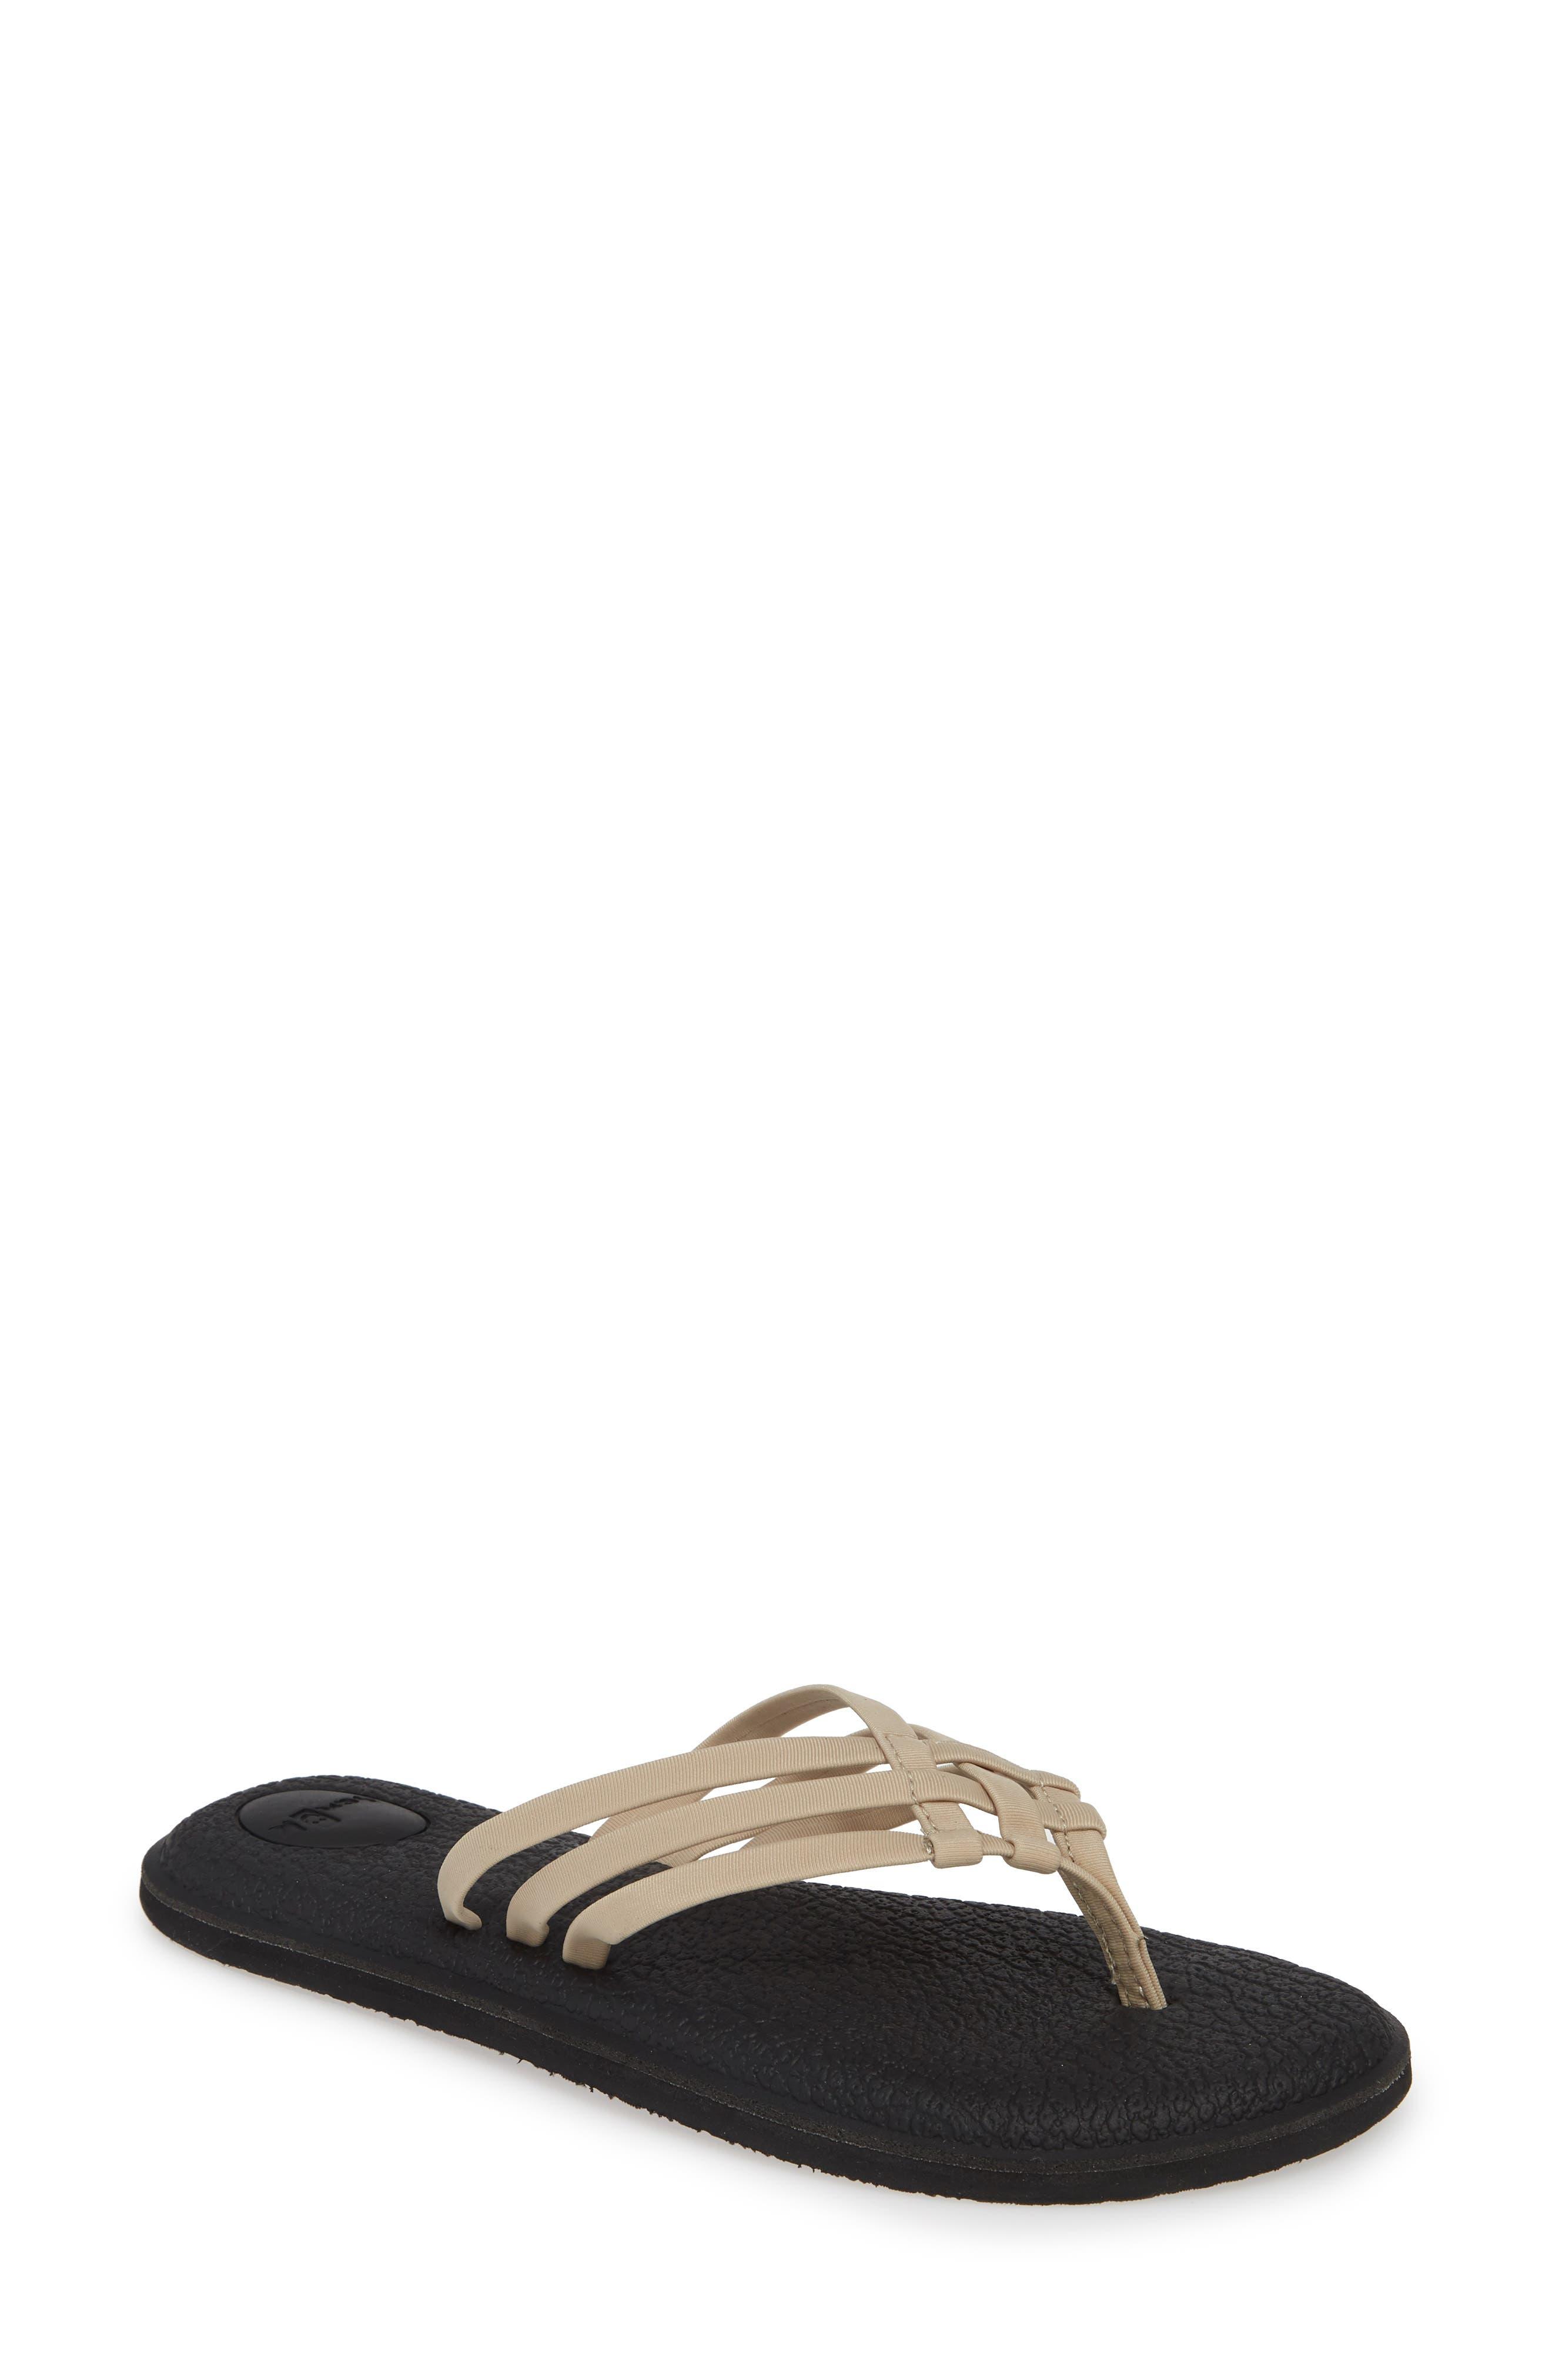 SANUK Yoga Salty Flip Flop, Main, color, NATURAL